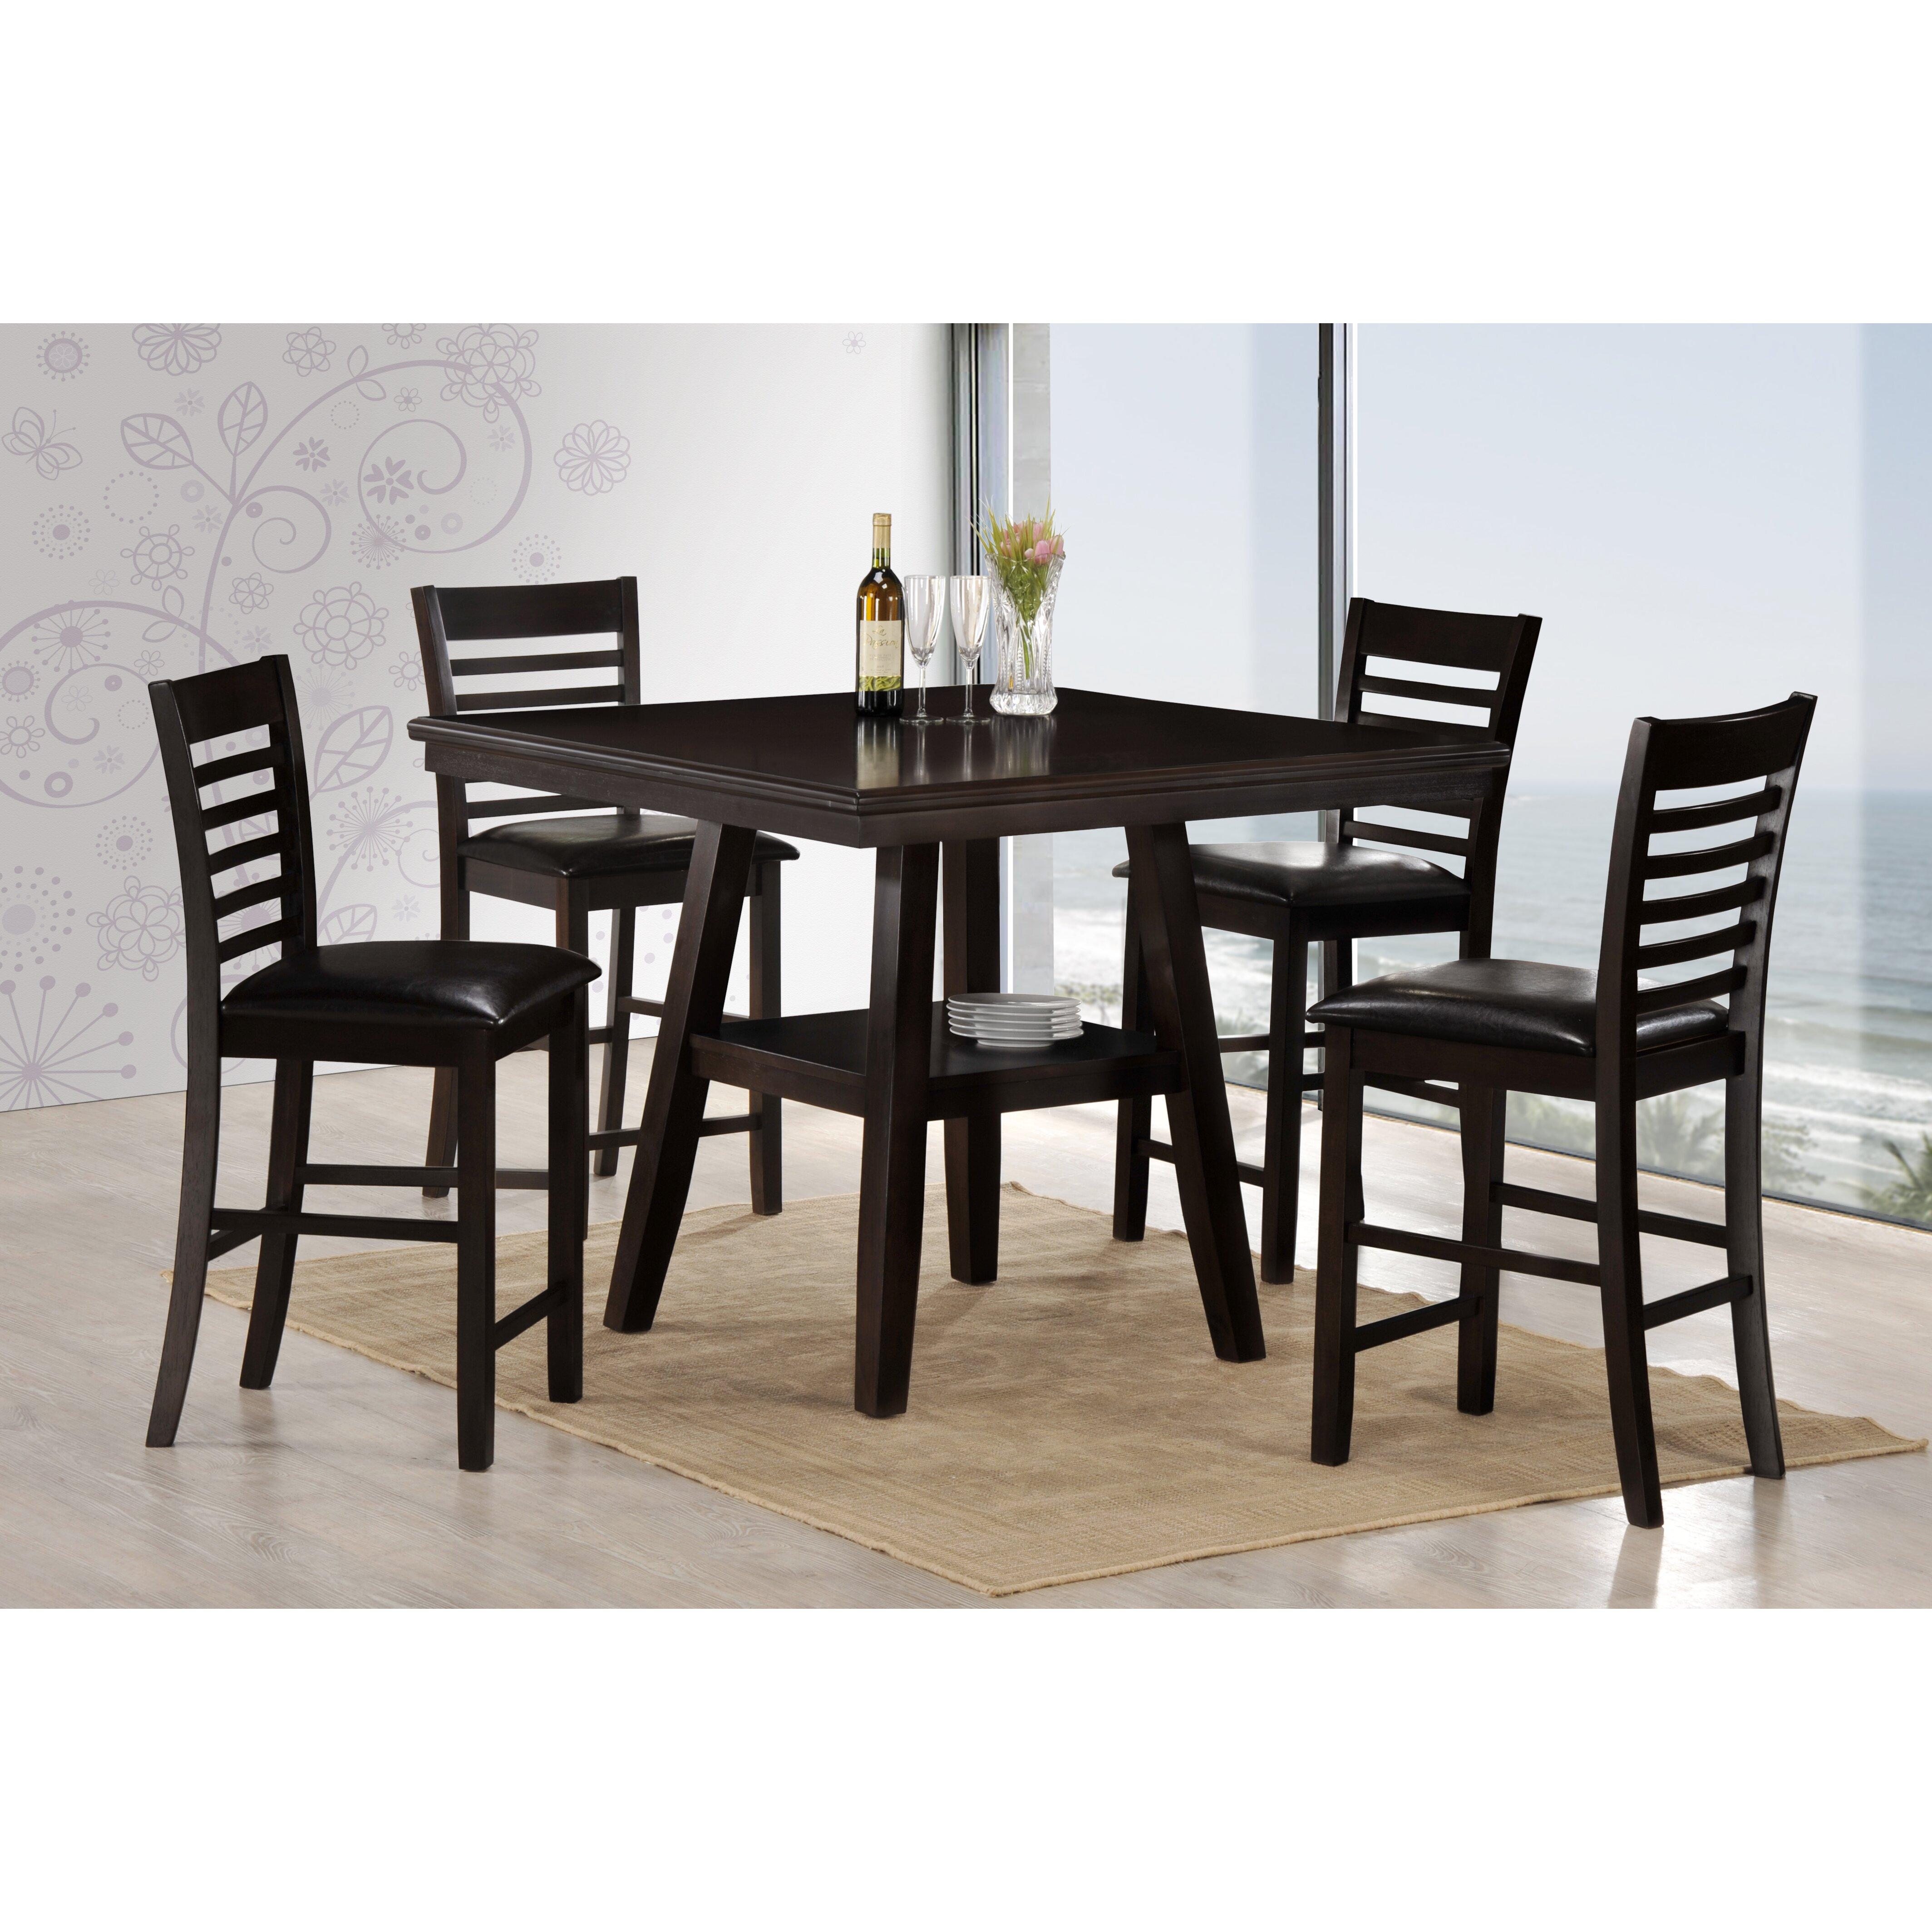 Square Coffee Table By Latitude Run: Latitude Run Harrells 5 Piece Dining Set By Simmons